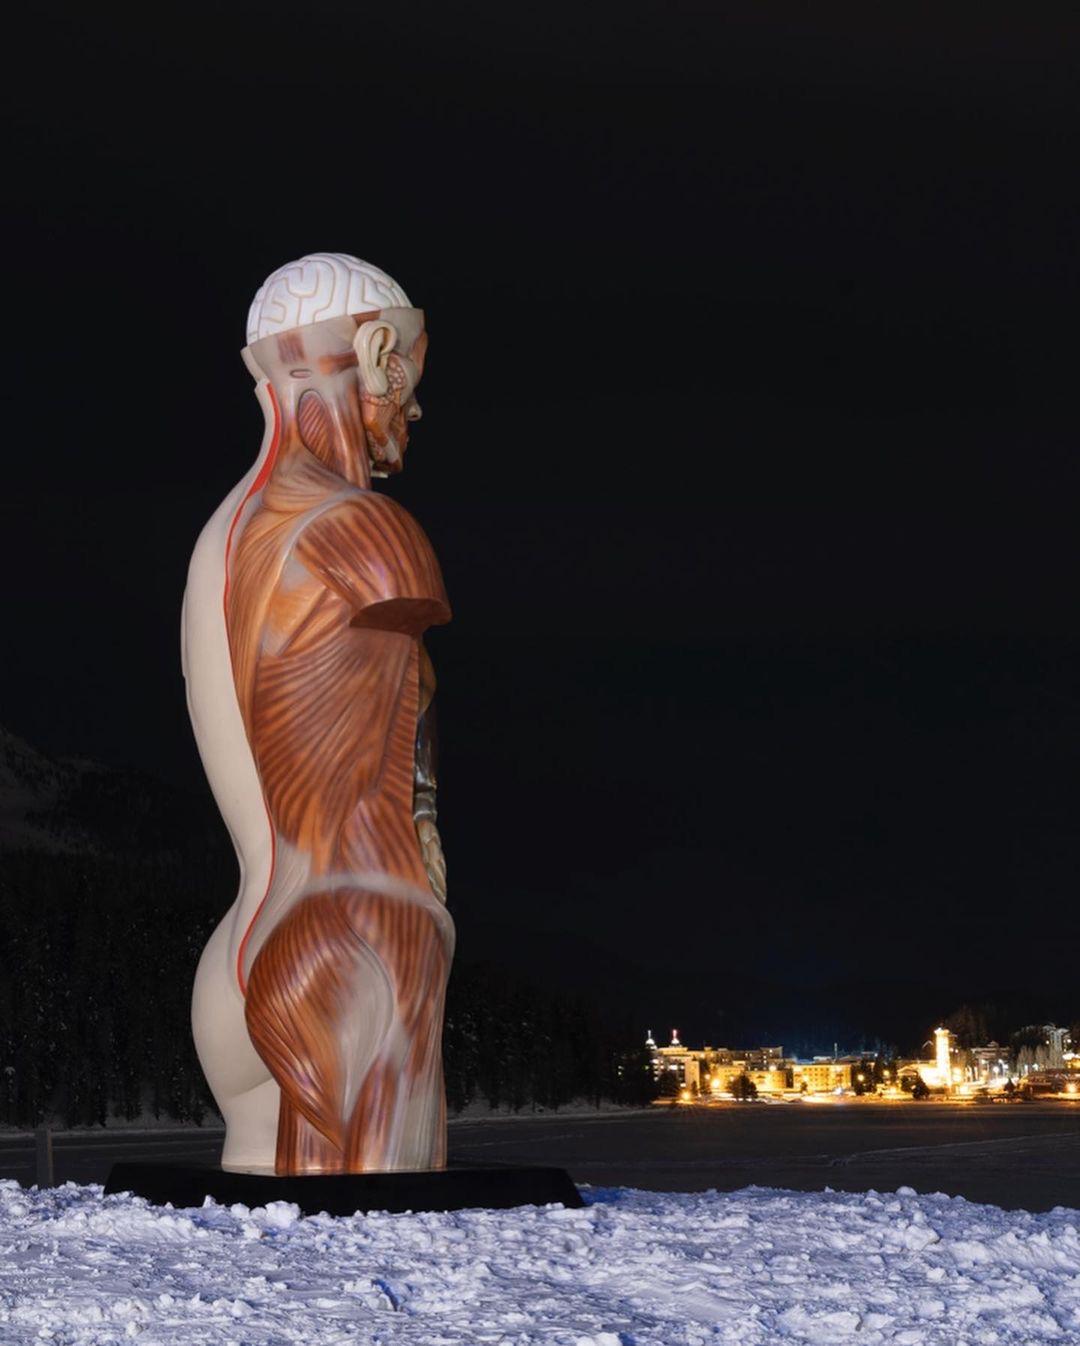 Damien Hirst, Temple, 2021, St Moritz, Dimlej (4)